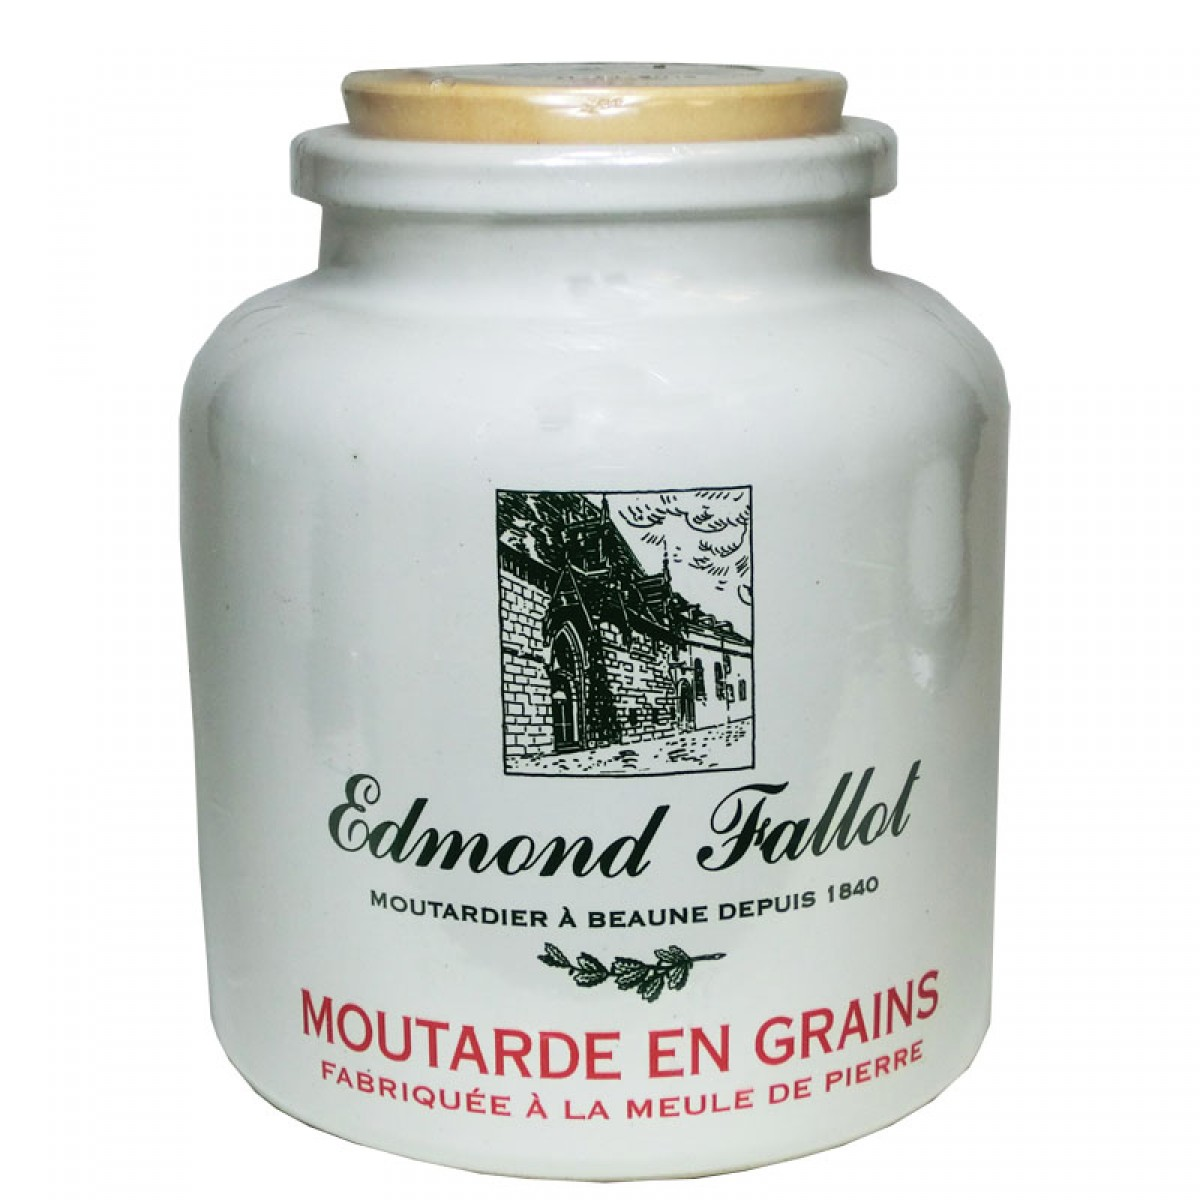 Moutarde en grains en pot de gr s 500g fallot saveurs de bourgogne vente - Moutarde fallot vente ...